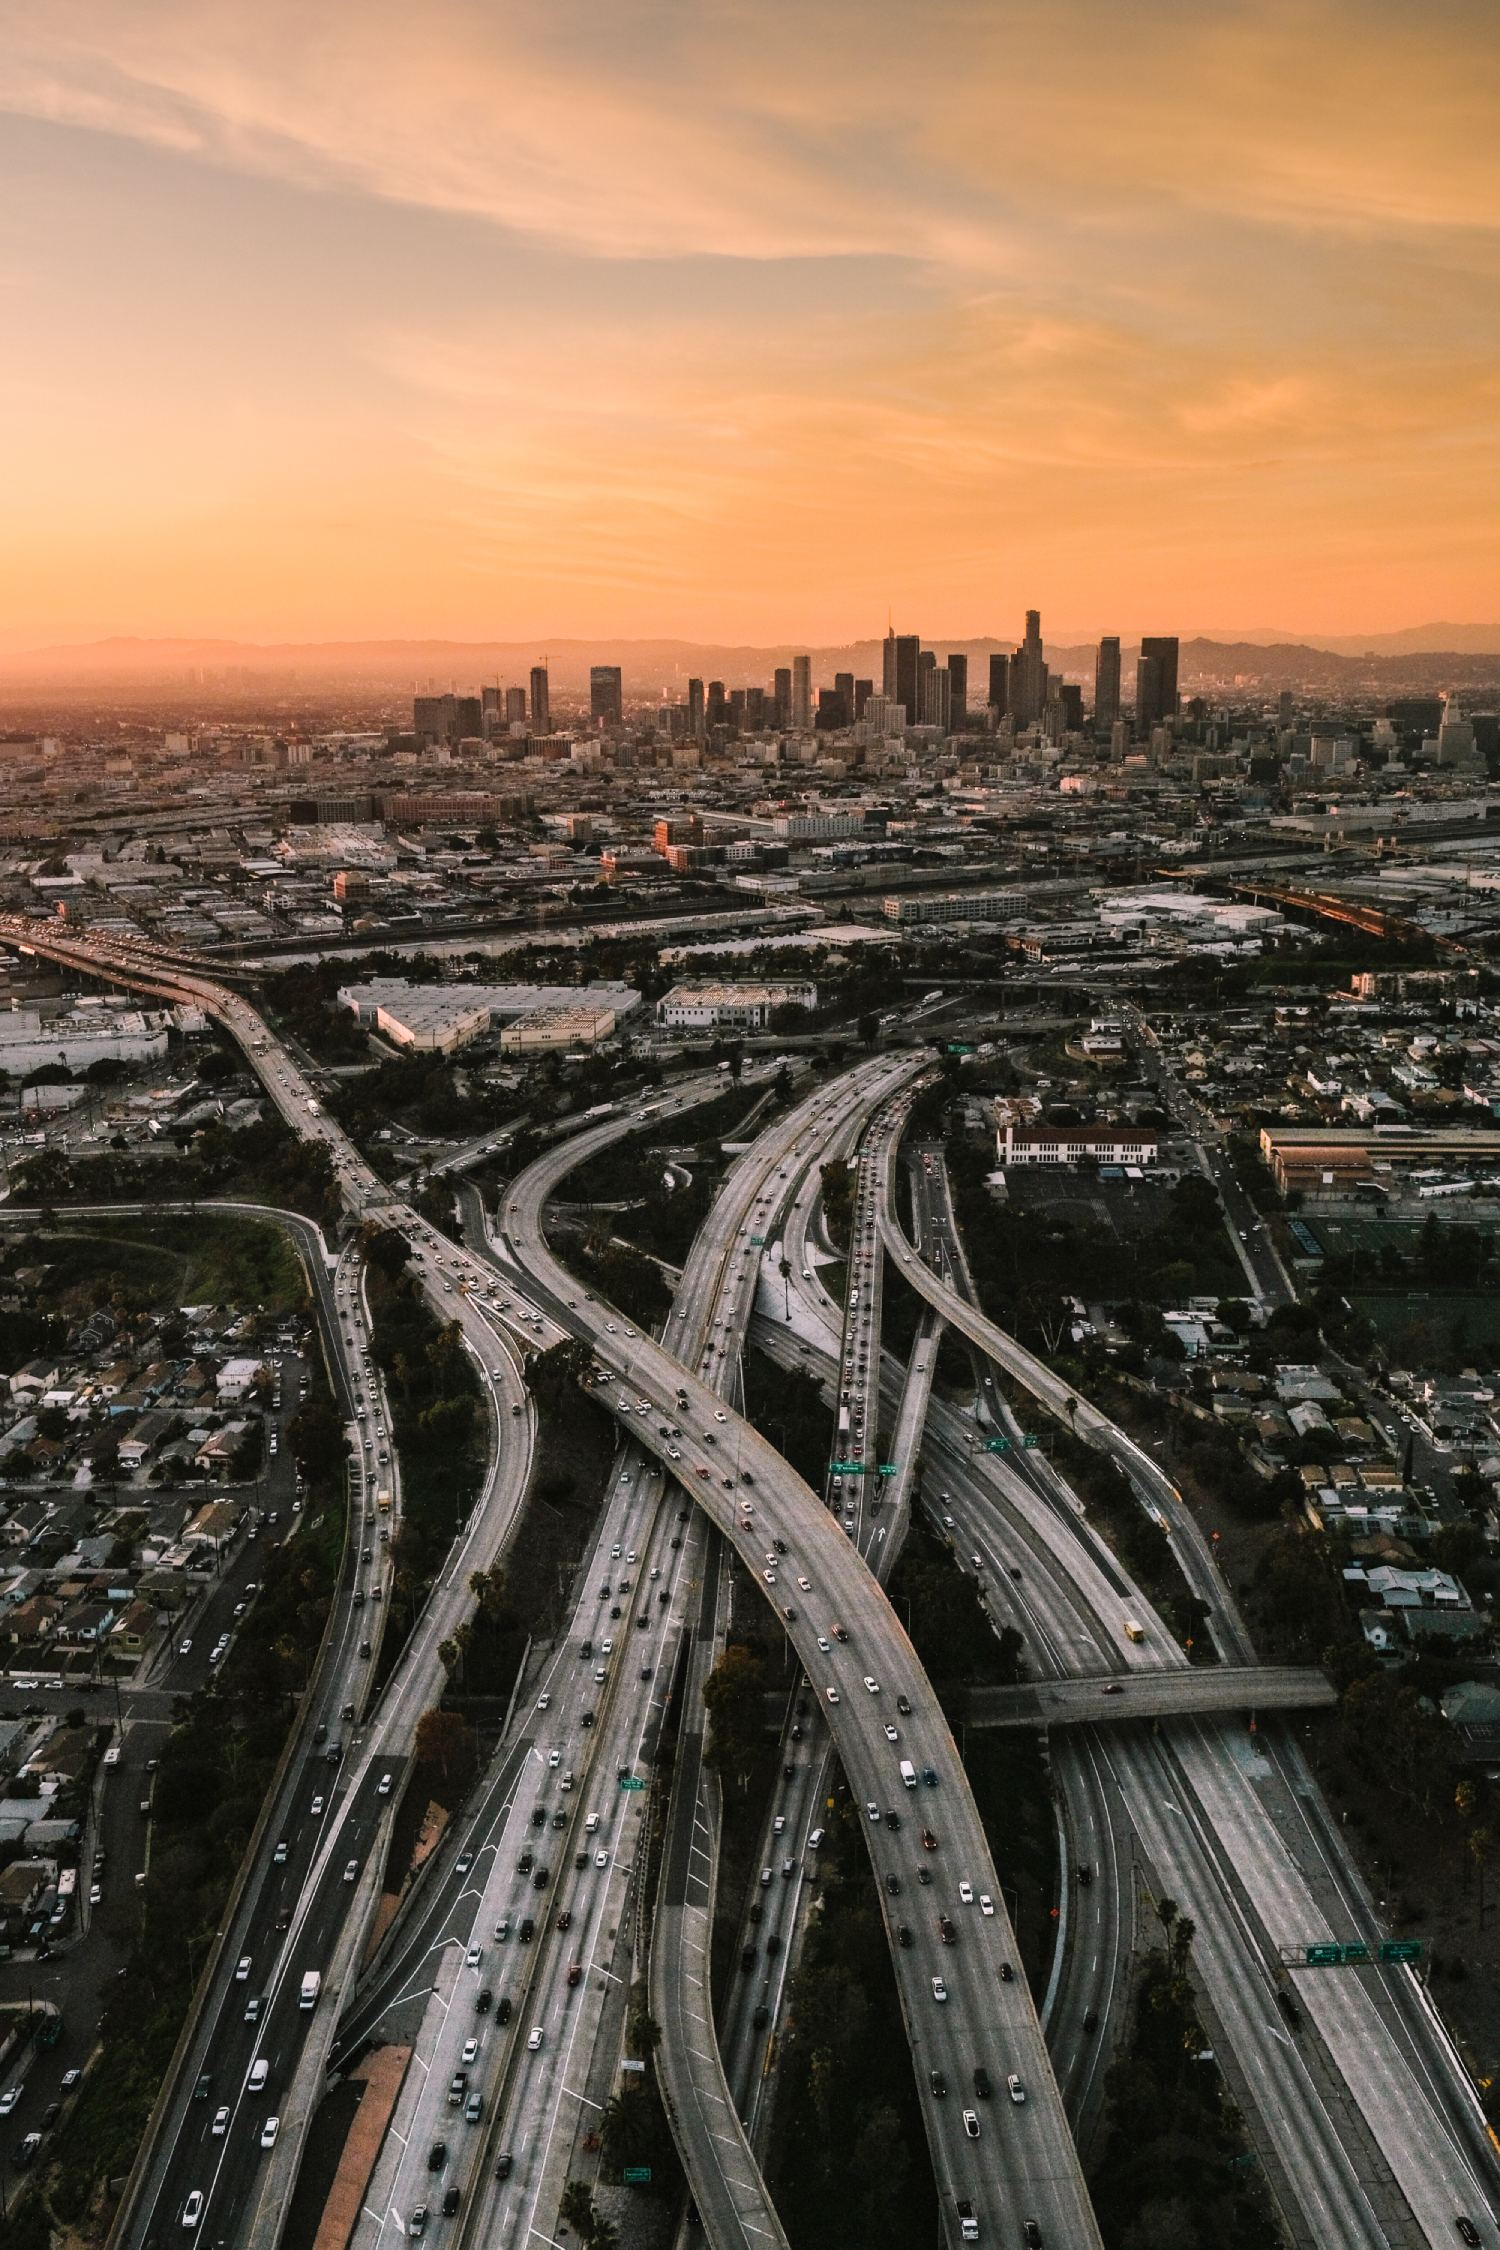 View over motorways towards city skyline on the horizon, shot using Fujifilm X-T4